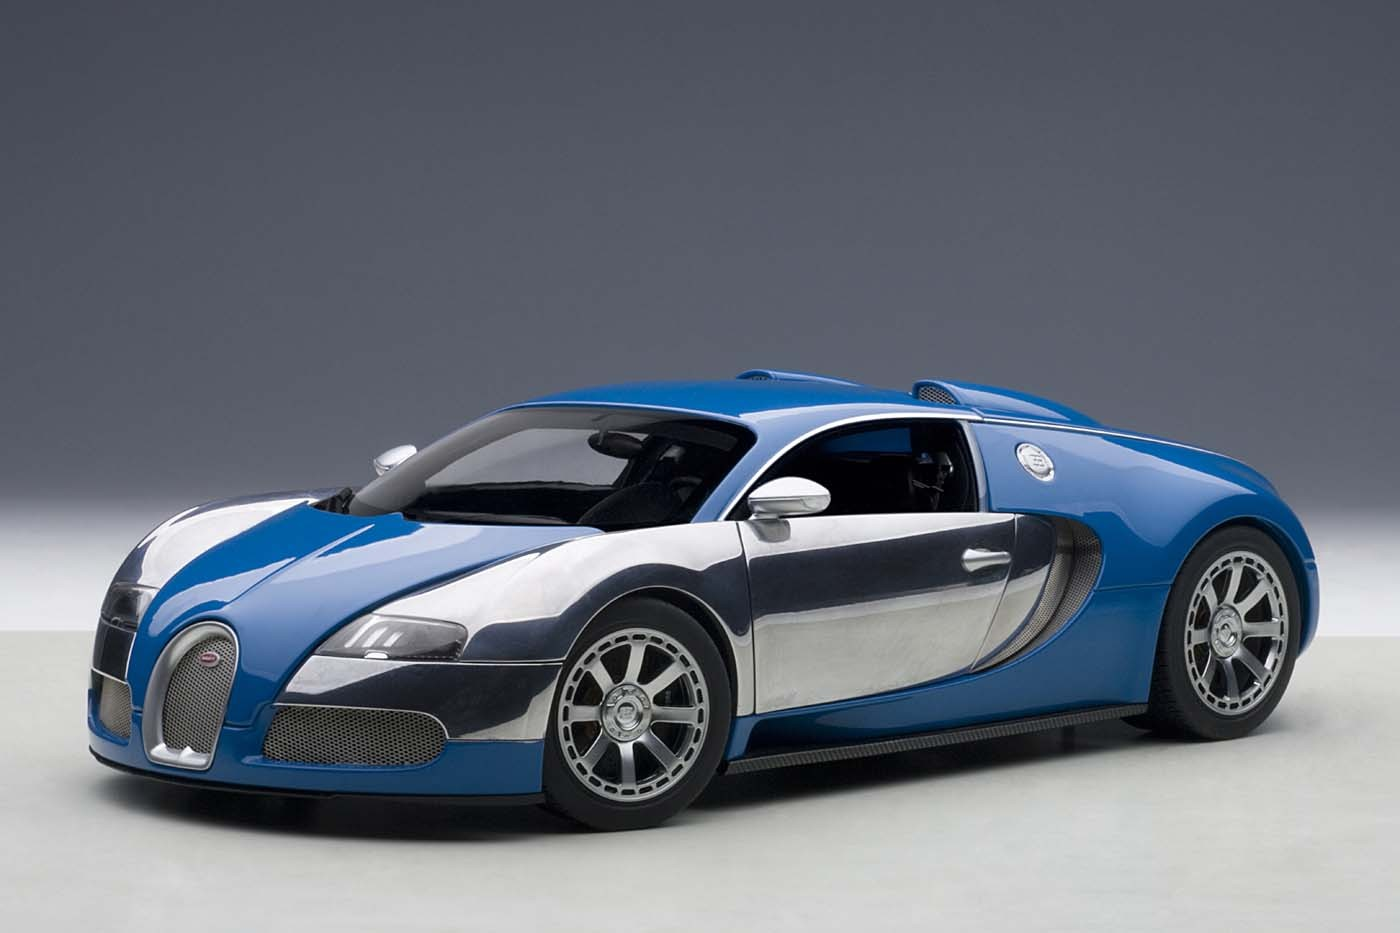 Blue Bugatti Veyron: Highly Detailed AUTOart Die-cast Model Blue/white Bugatti